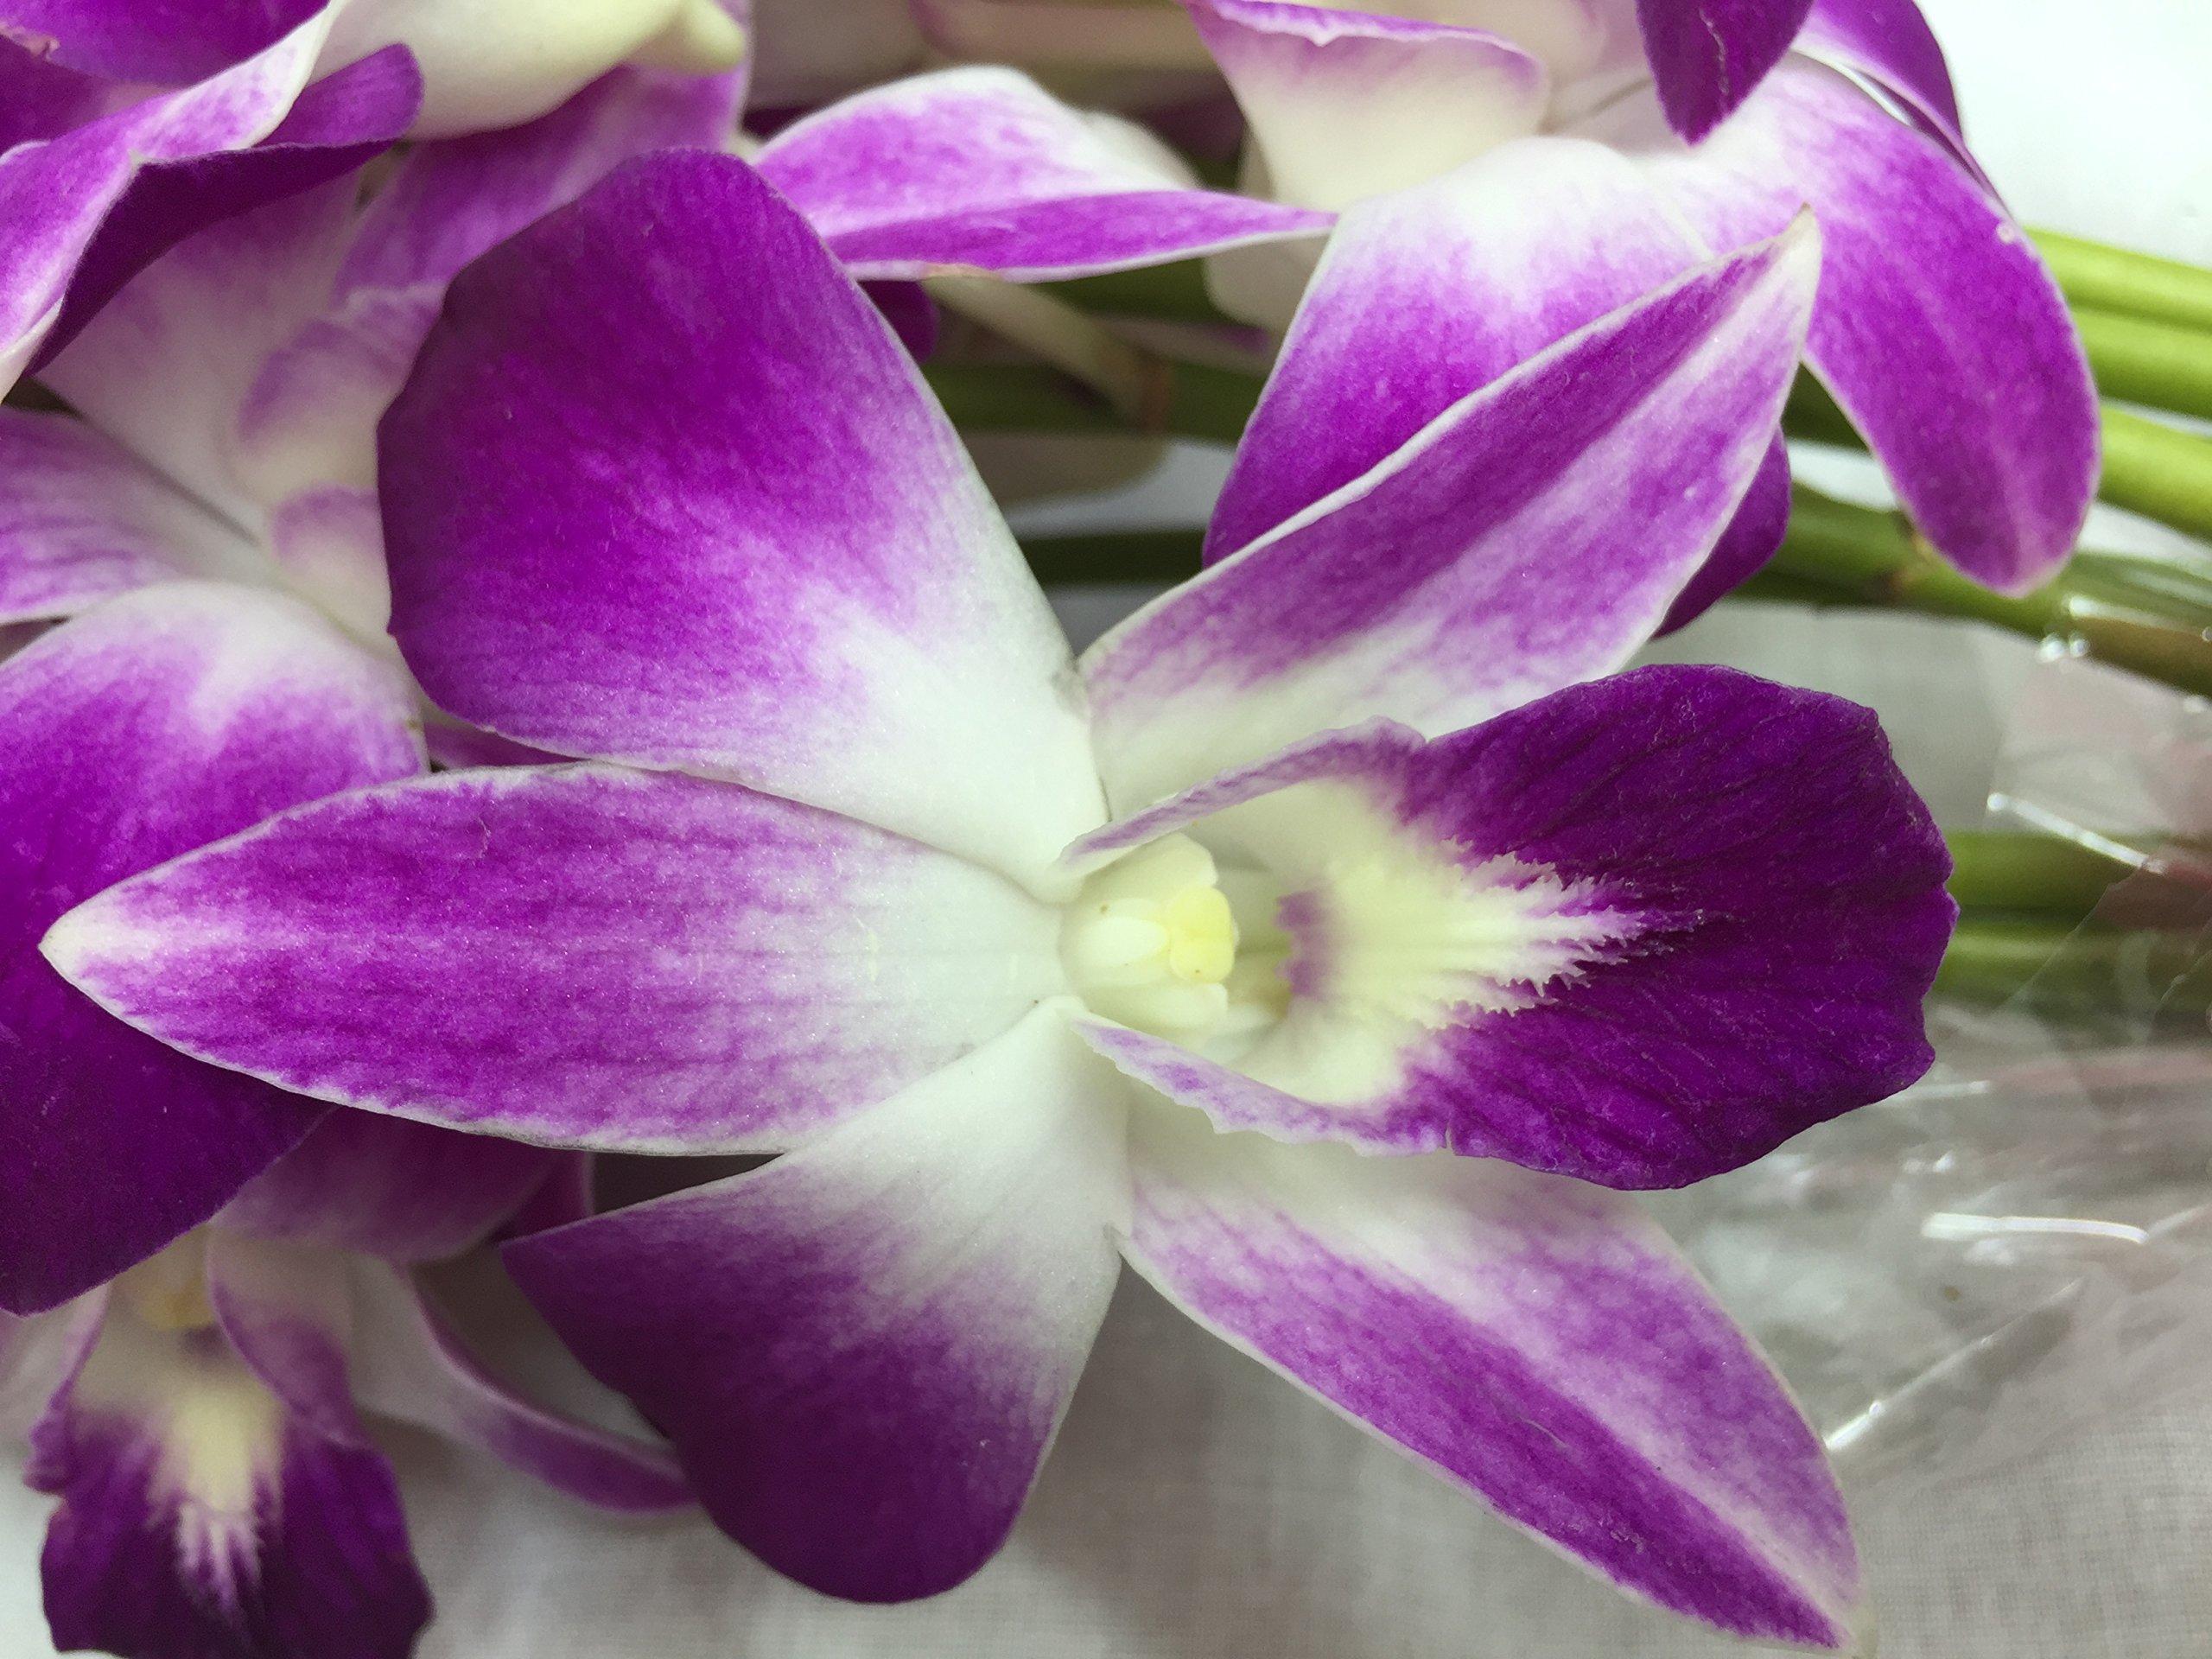 Premium Cut Purple Orchids (20 stems with Vase) by eflowerwholesale